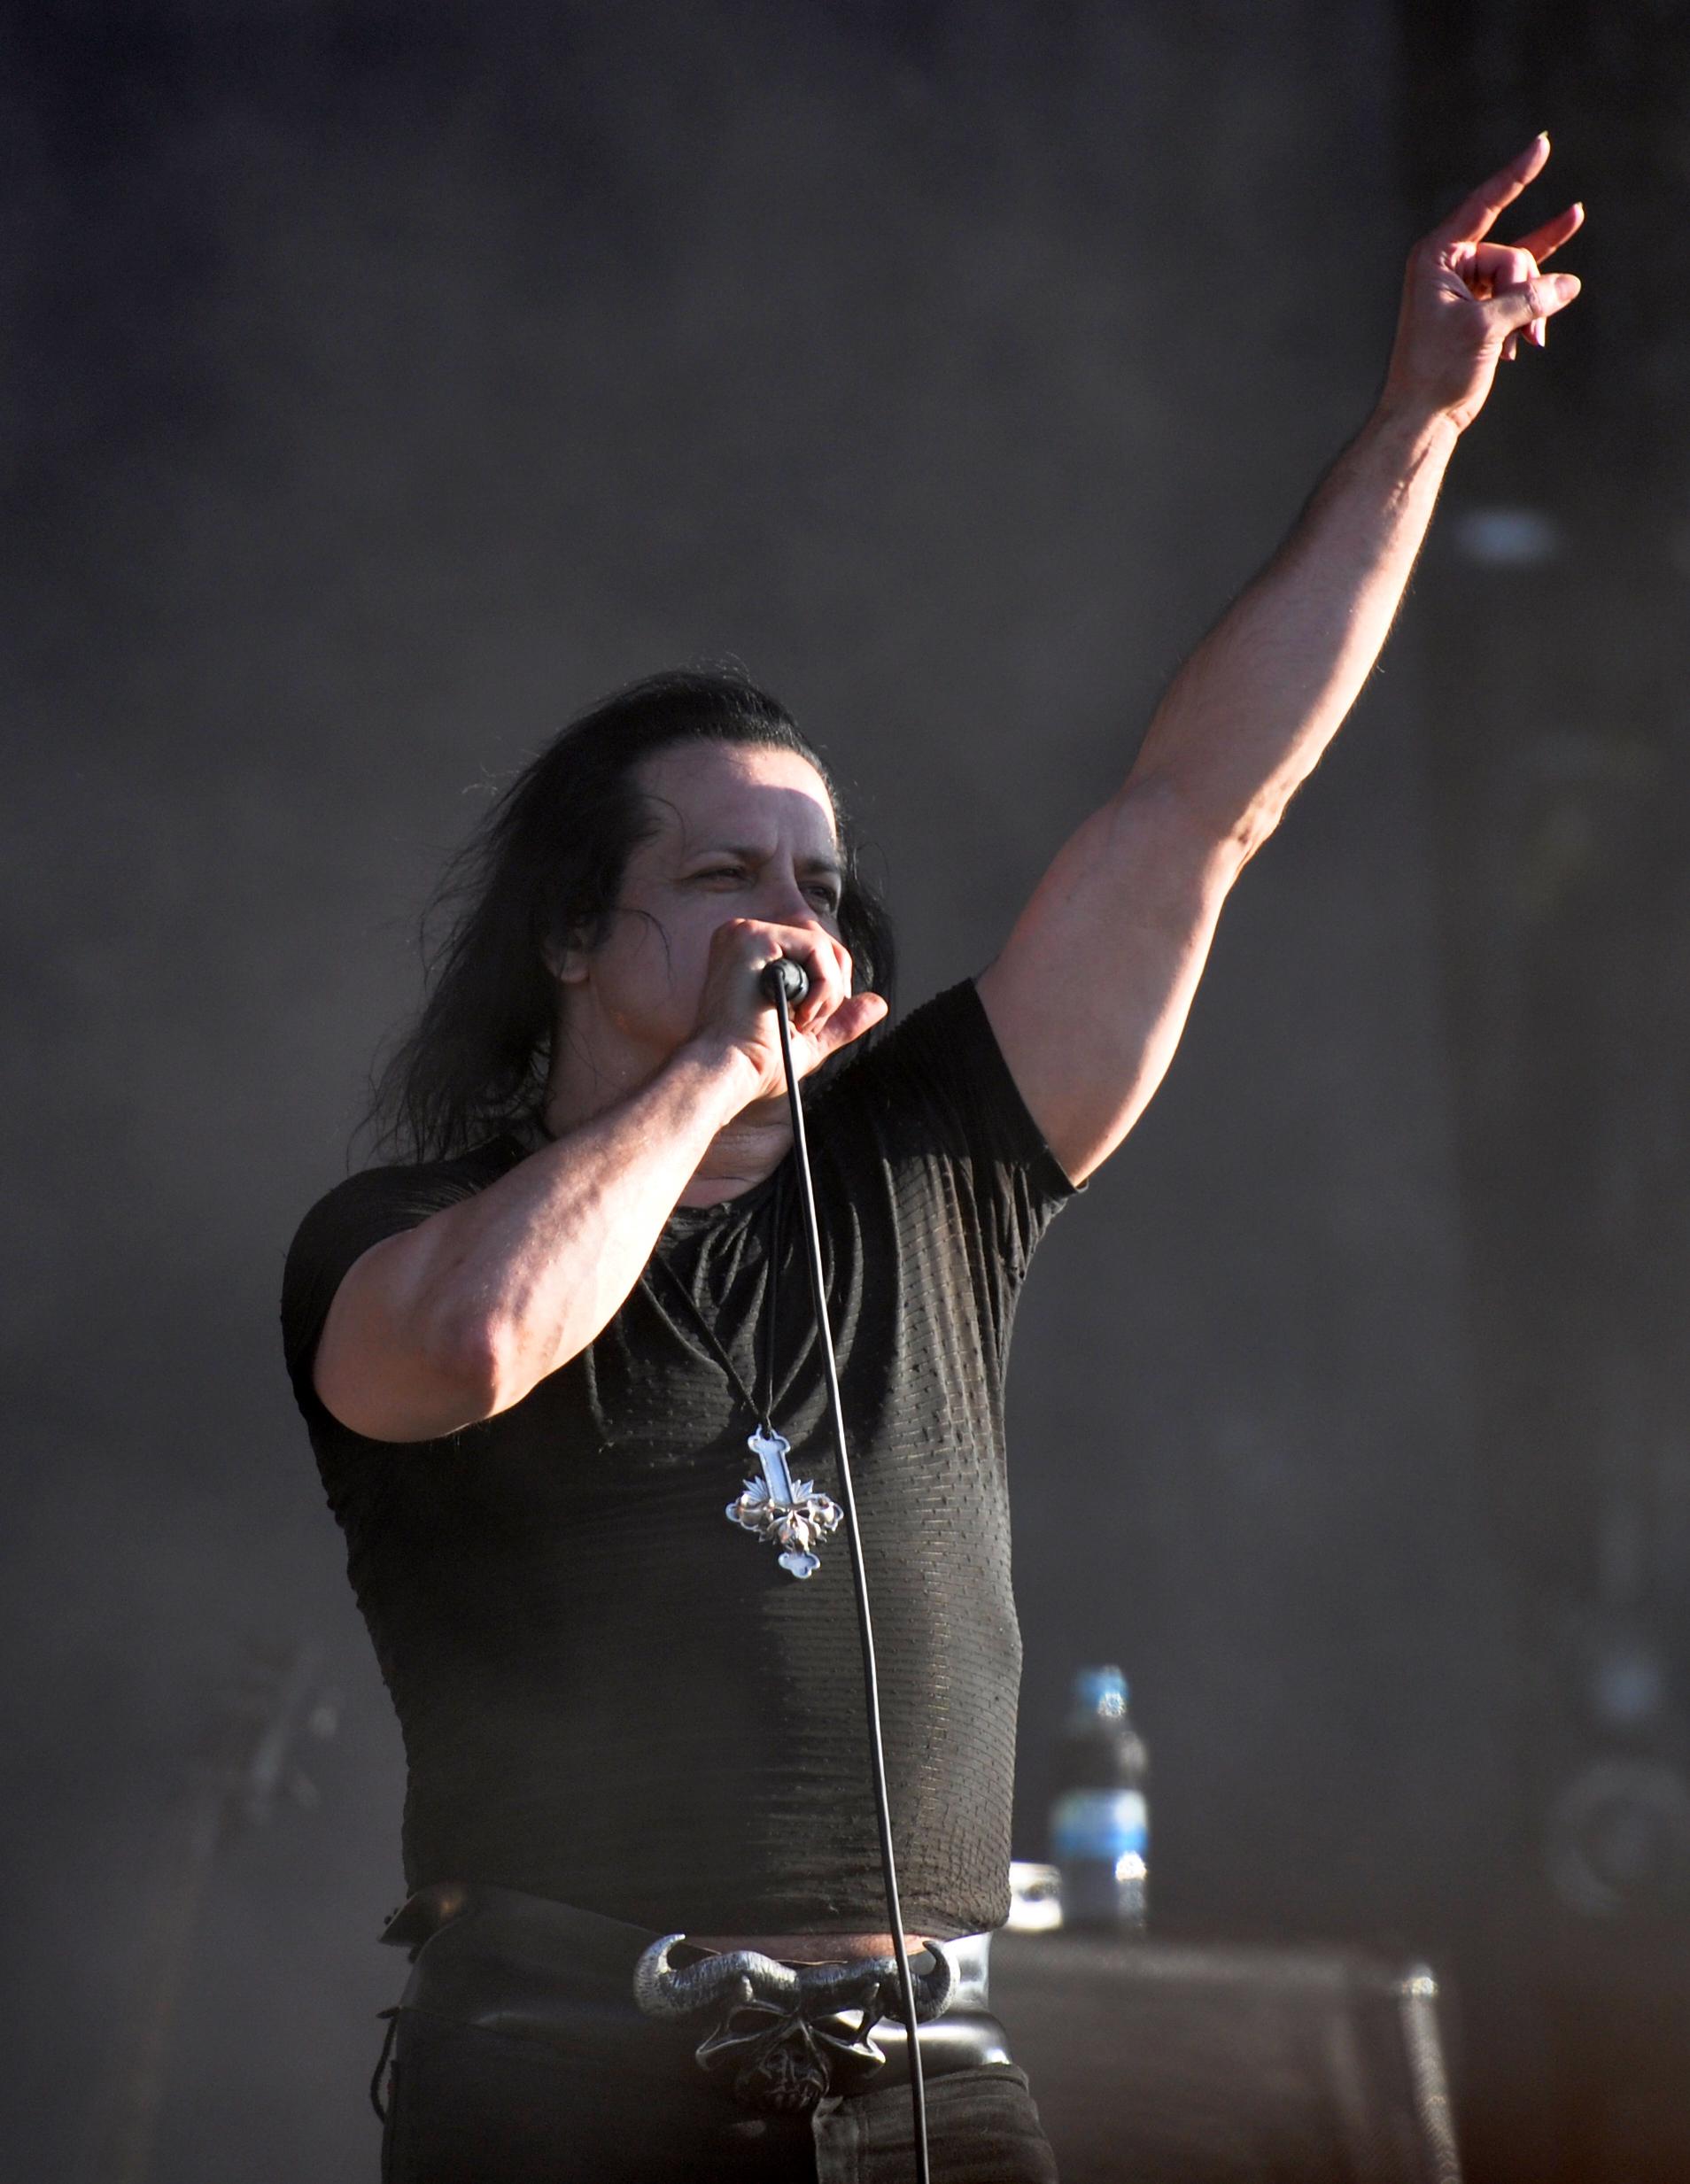 Glenn Danzig - Wikipedia